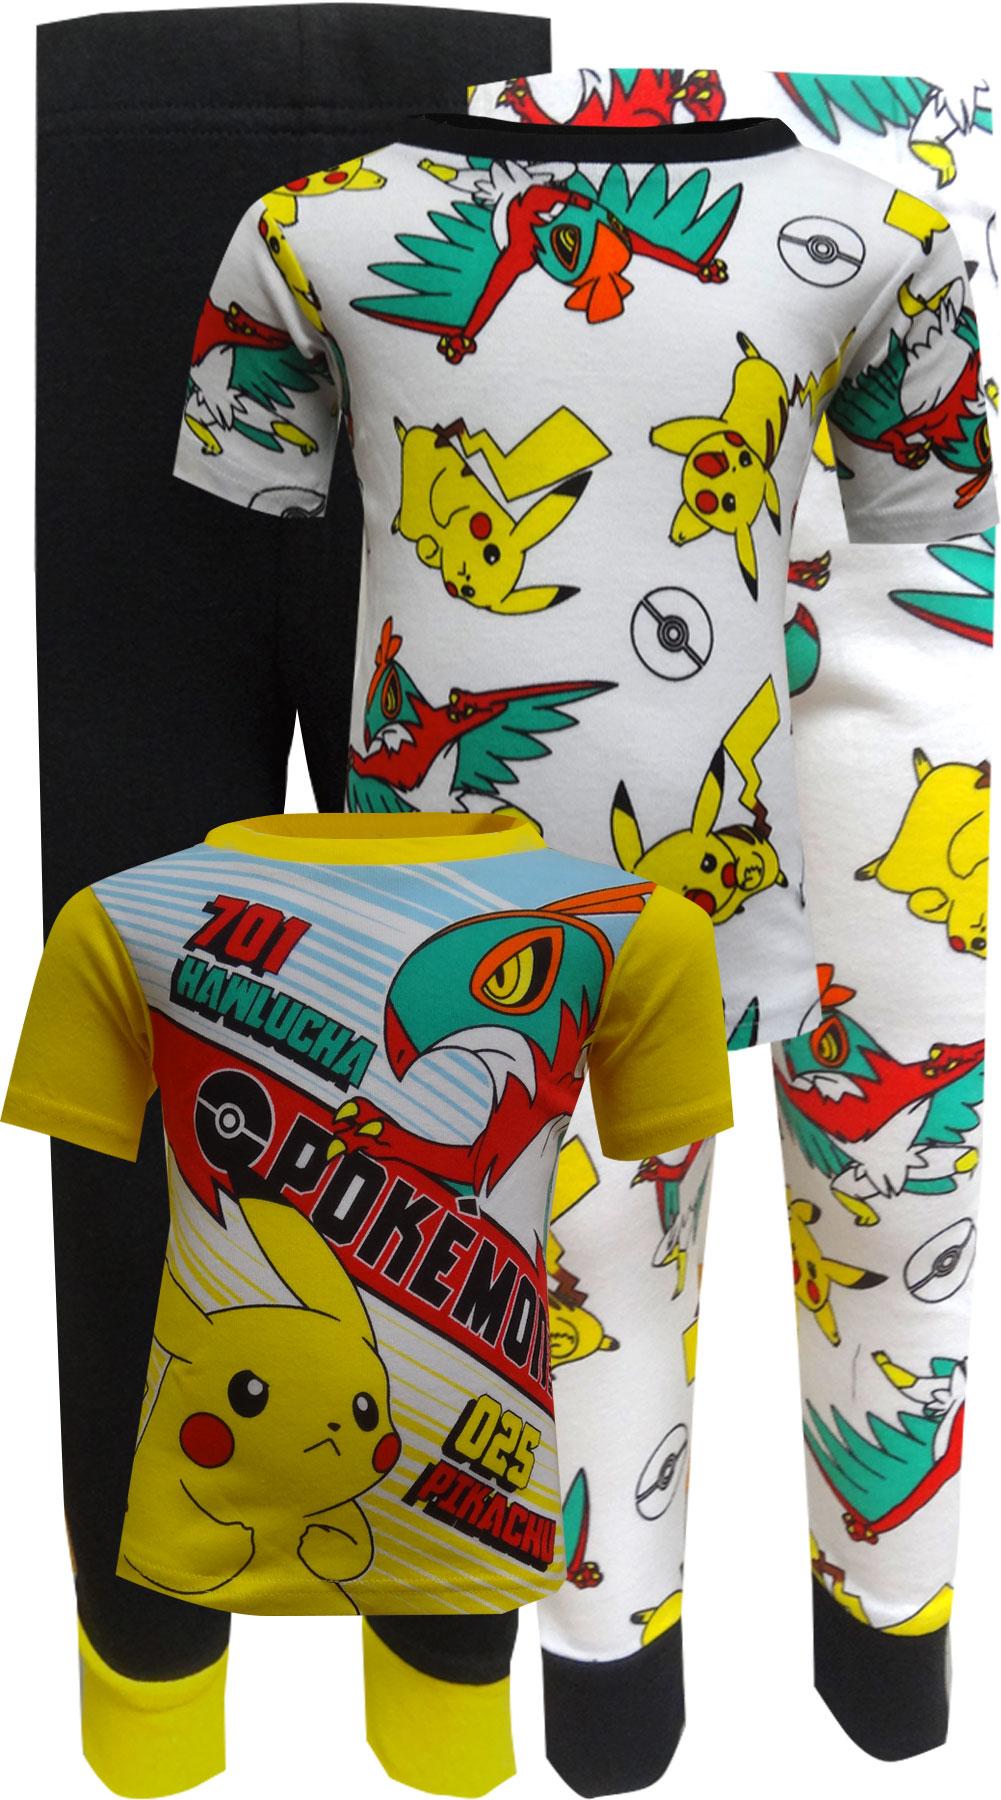 Image of Pokemon Characters Cotton 4 Piece Pajamas for boys